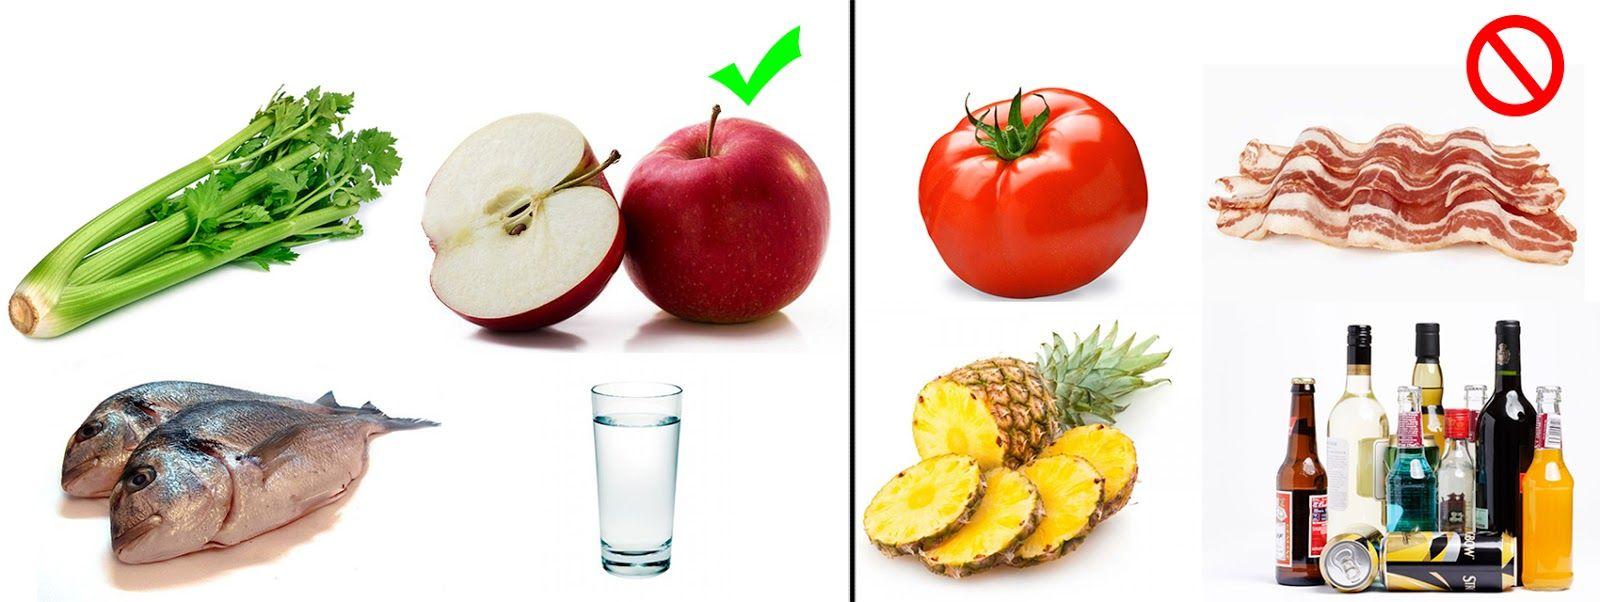 Dieta para evitar sindrome de dumping